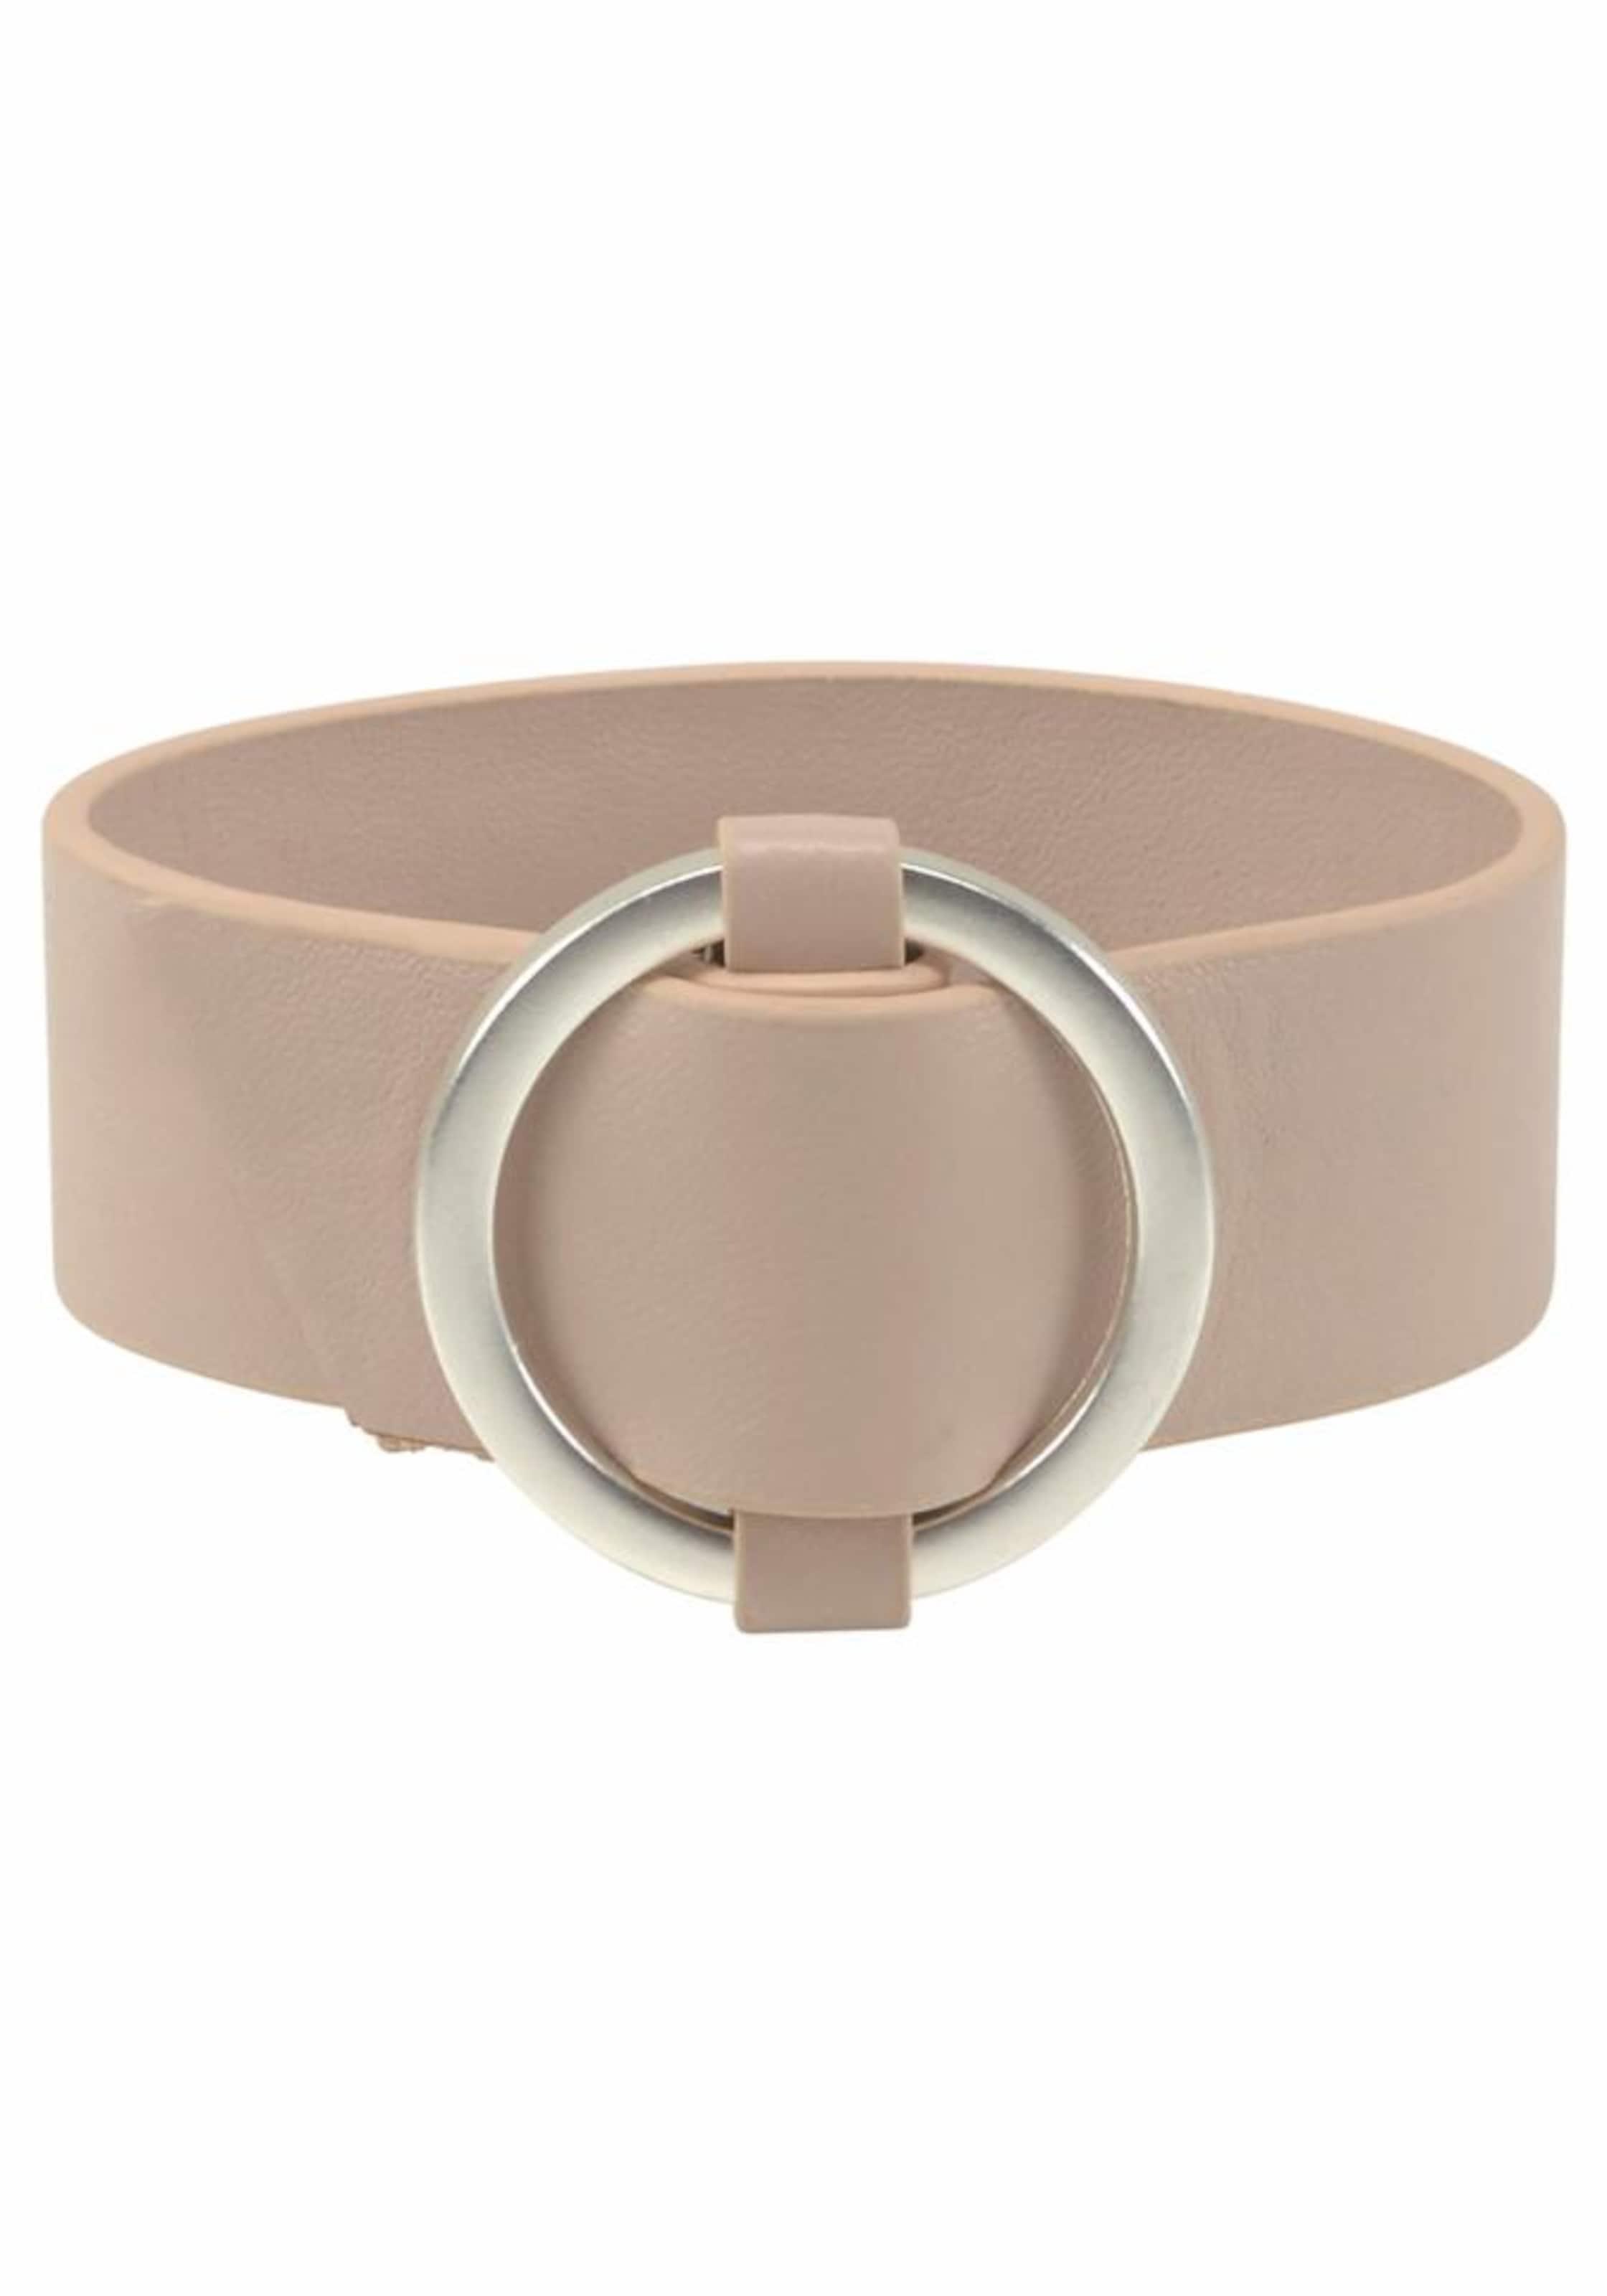 Echte Online Qualität Outlet-Store J. Jayz Armband WGiIOPIyGR